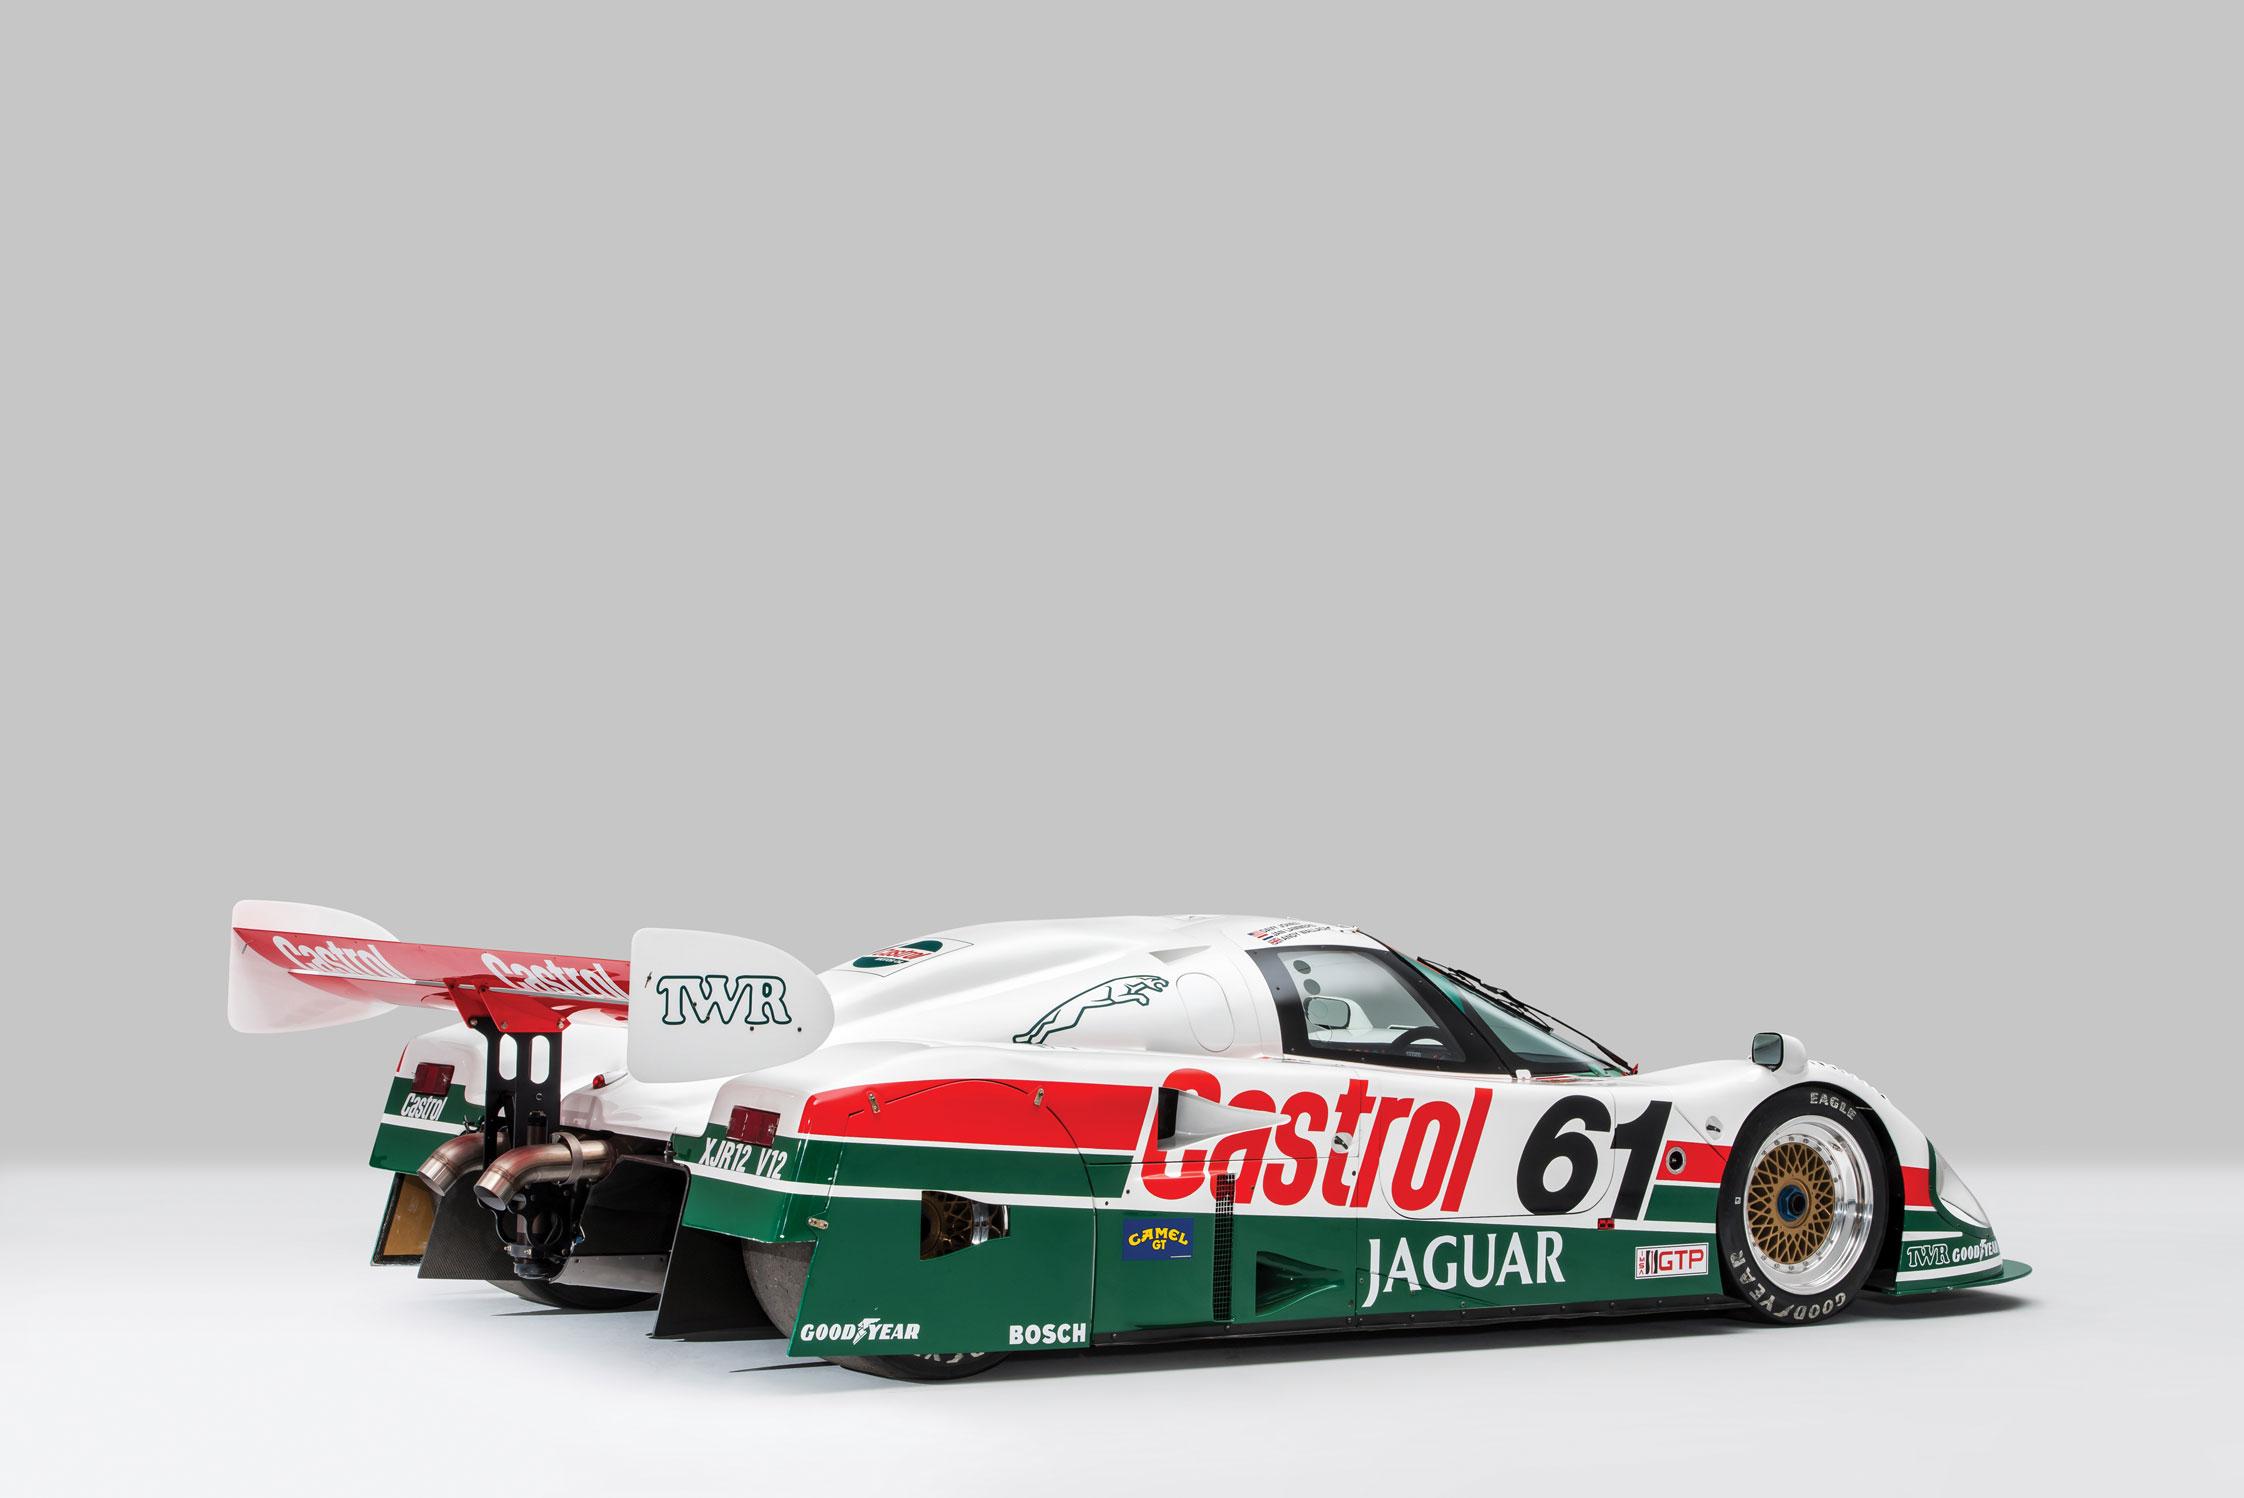 photo JAGUAR XJR-9 compétition 1988 - Motorlegend.com